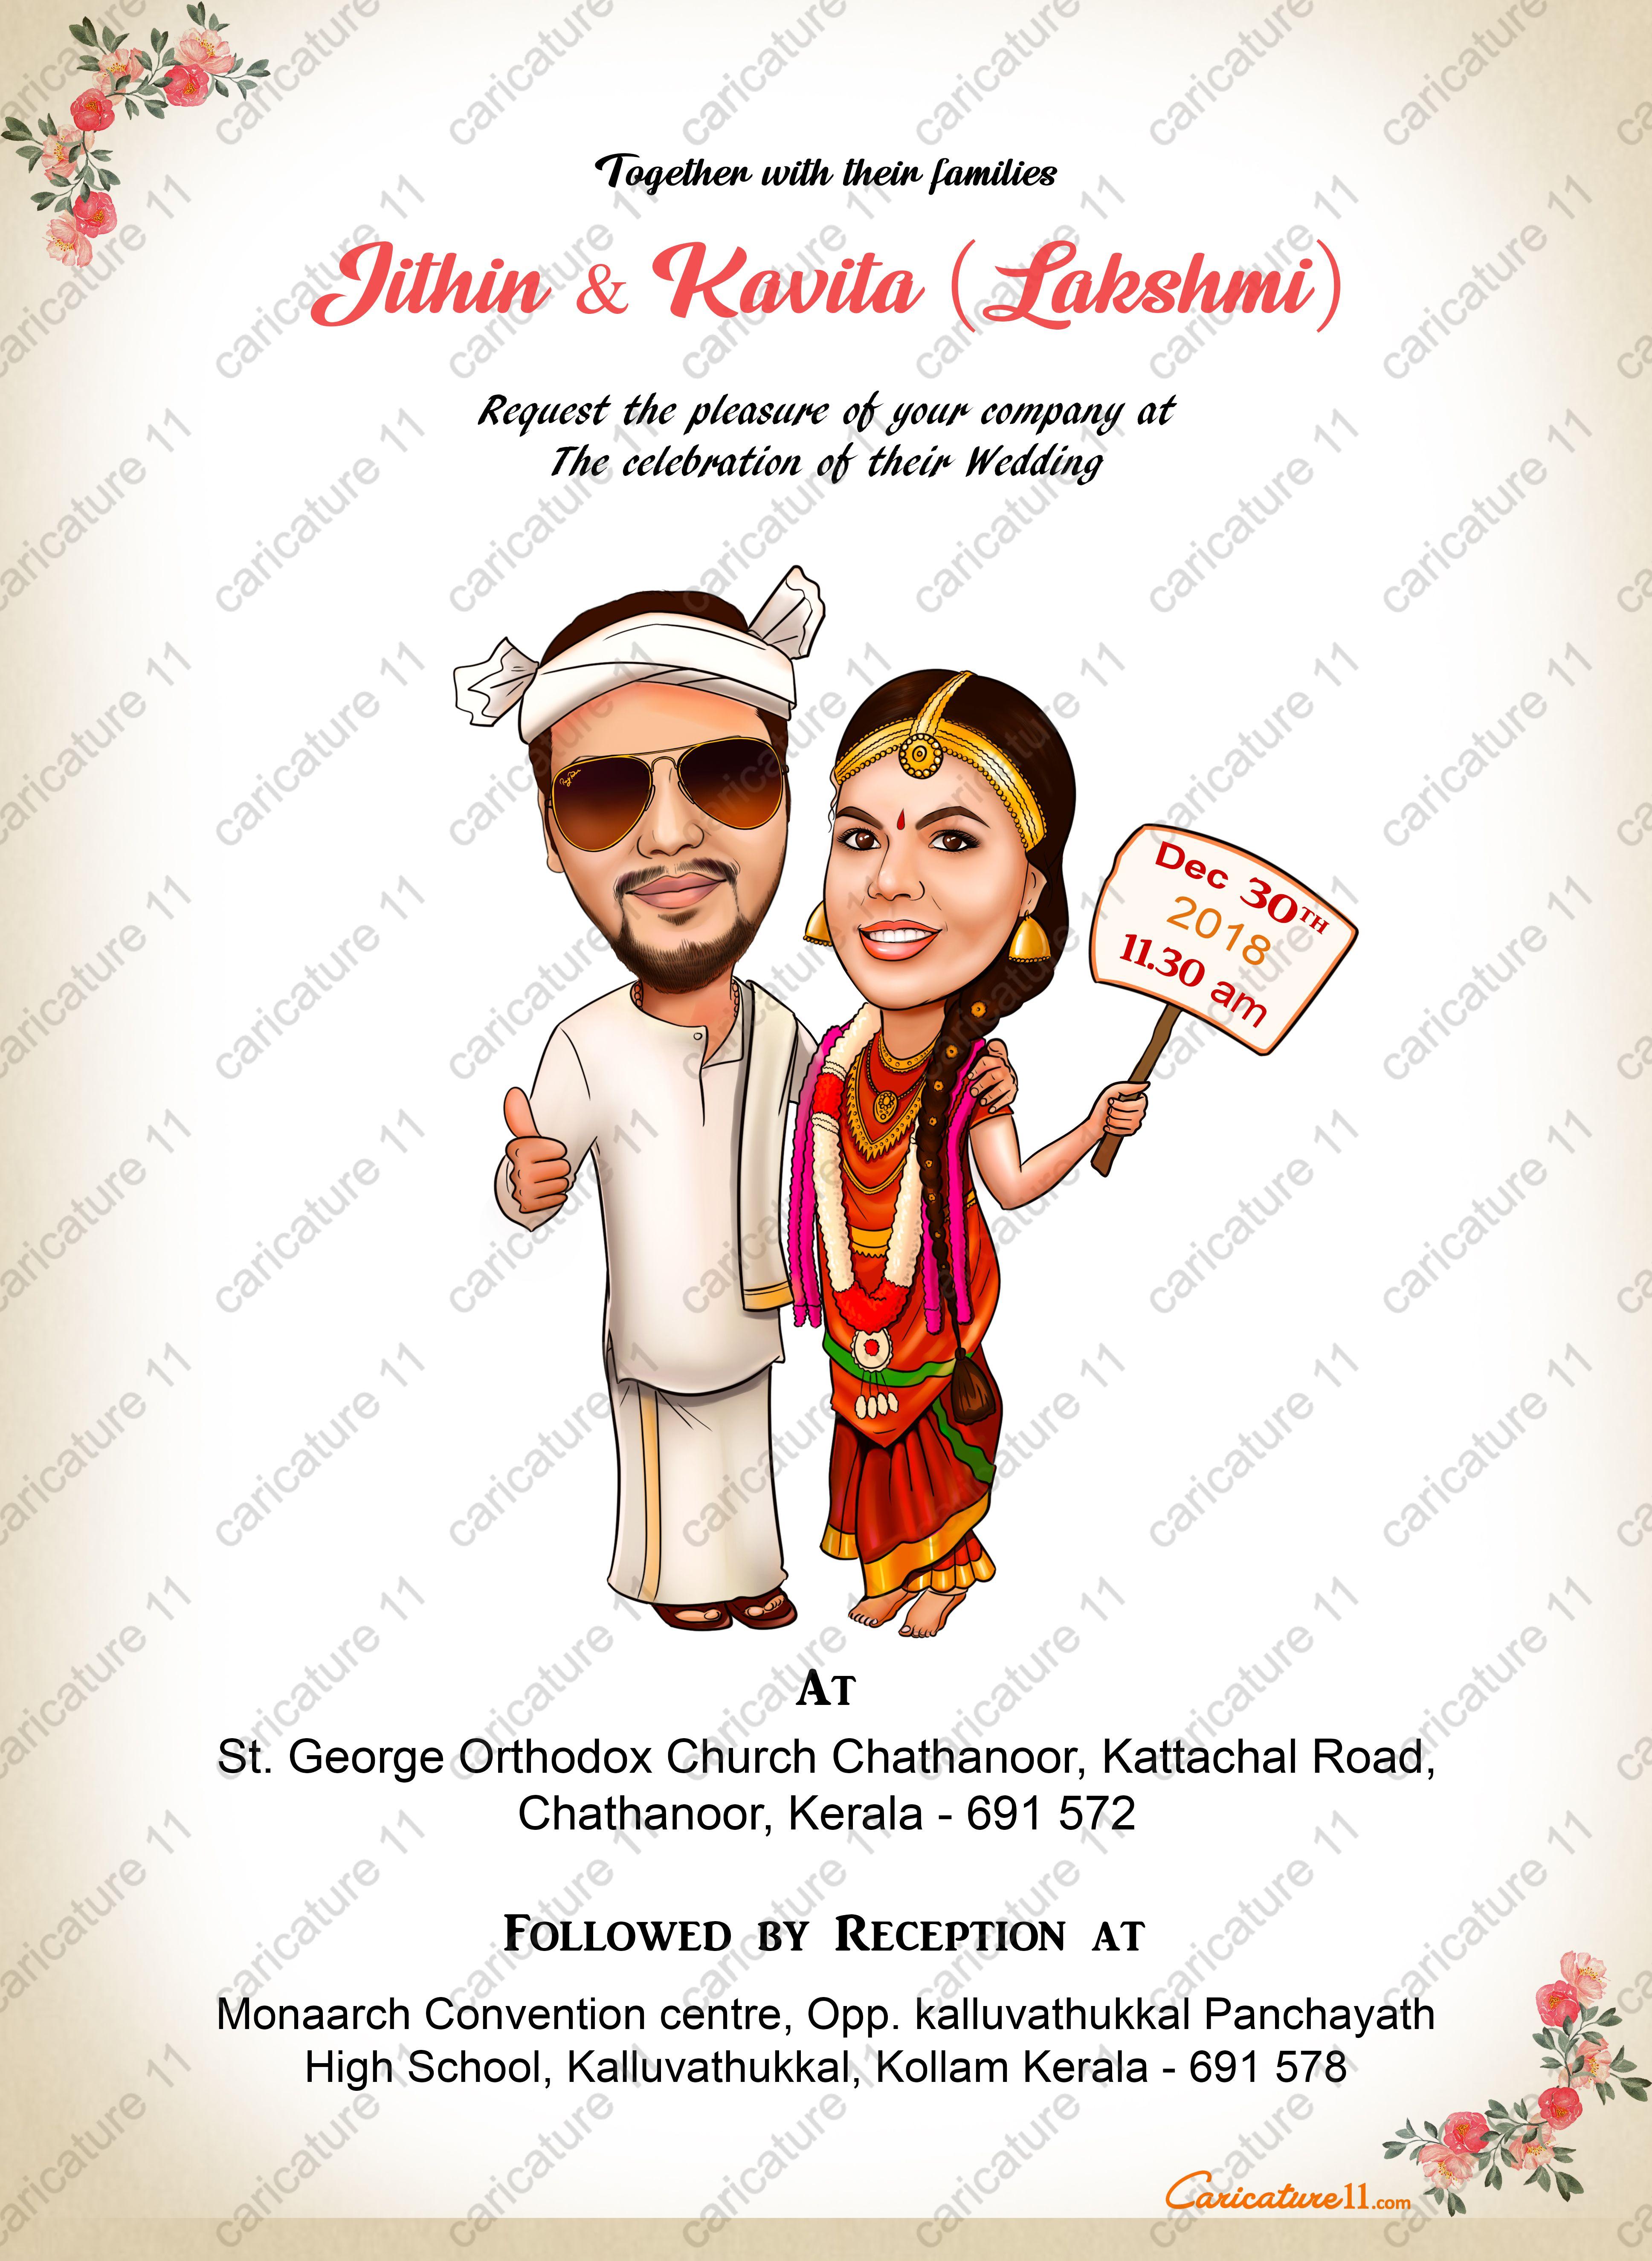 Couple Caricature Invitation Design Wedding Caricature Caricature Wedding Invitations Caricature Wedding Wedding Caricature